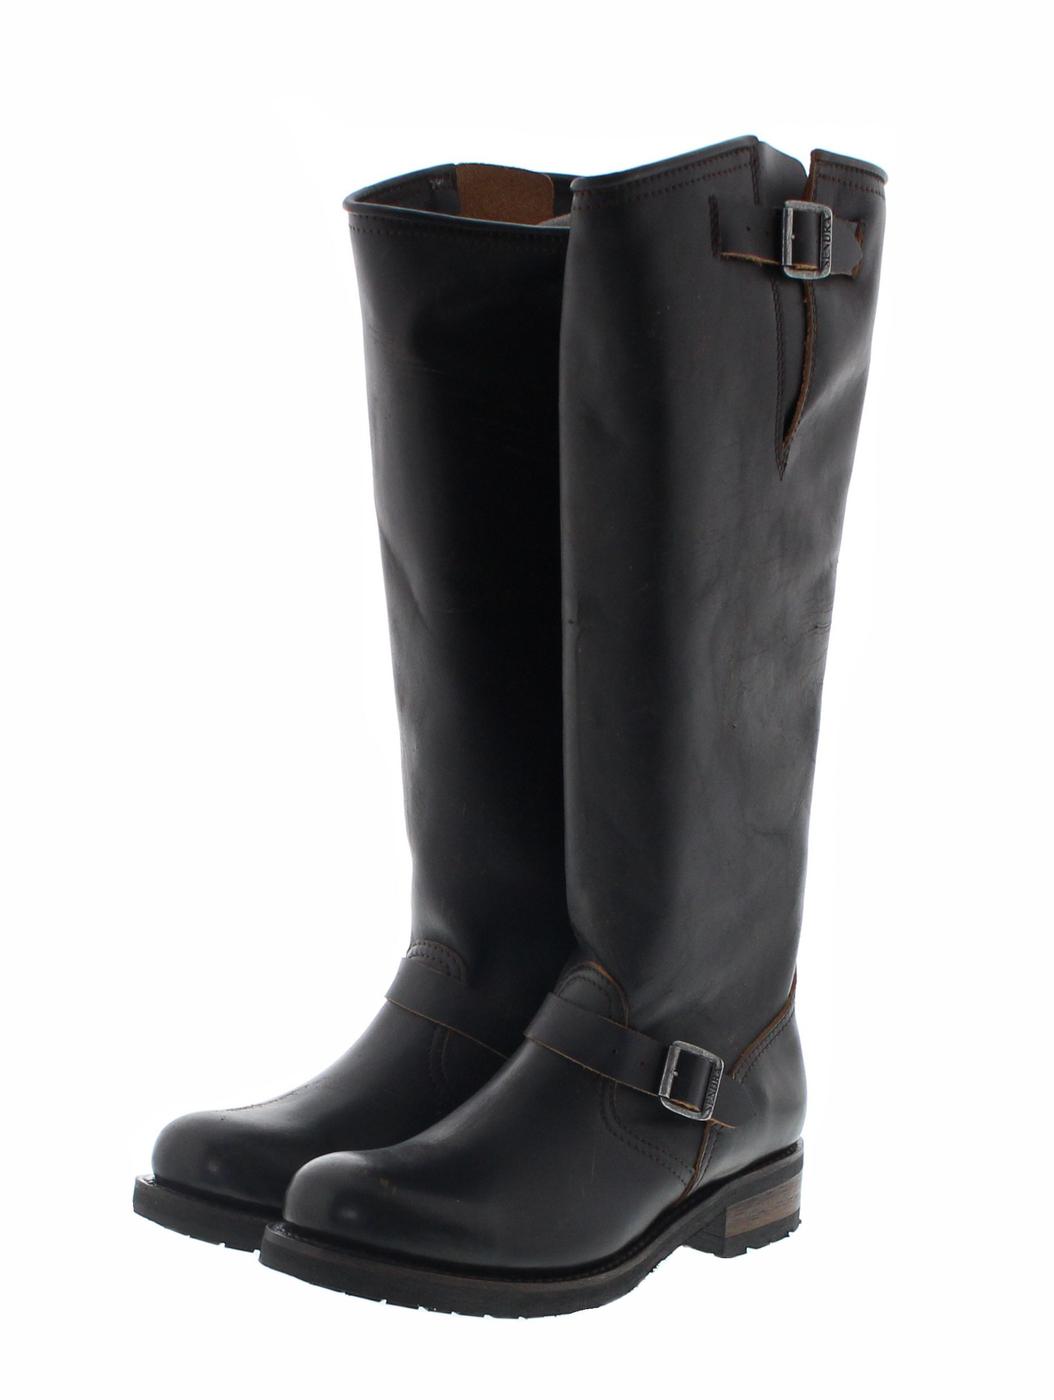 Sendra Boots 16084 Second Hand Negro Marron Damen Engineerstiefel braun